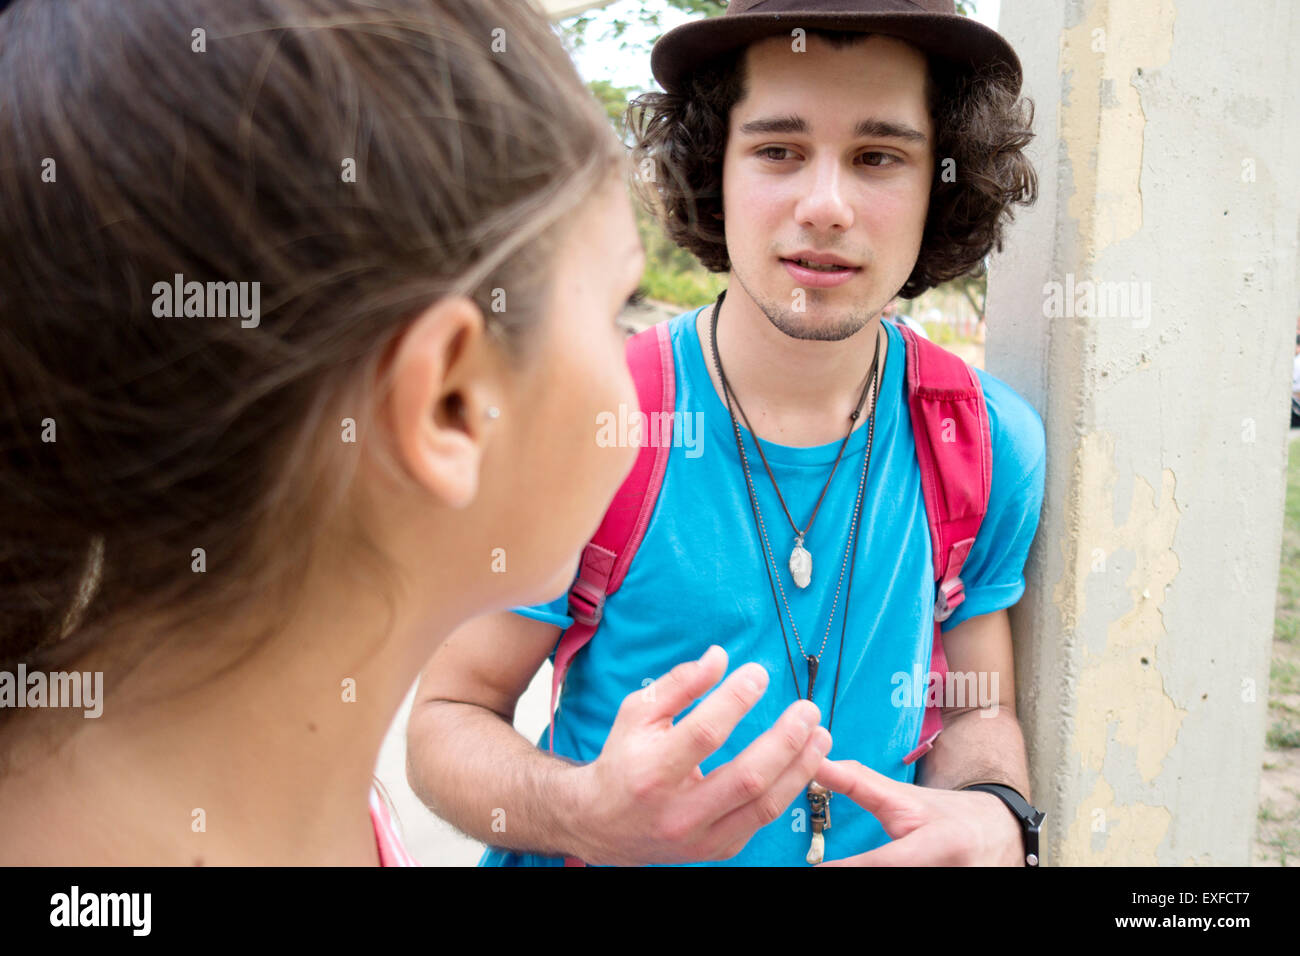 Par de hablar al aire libre Foto de stock